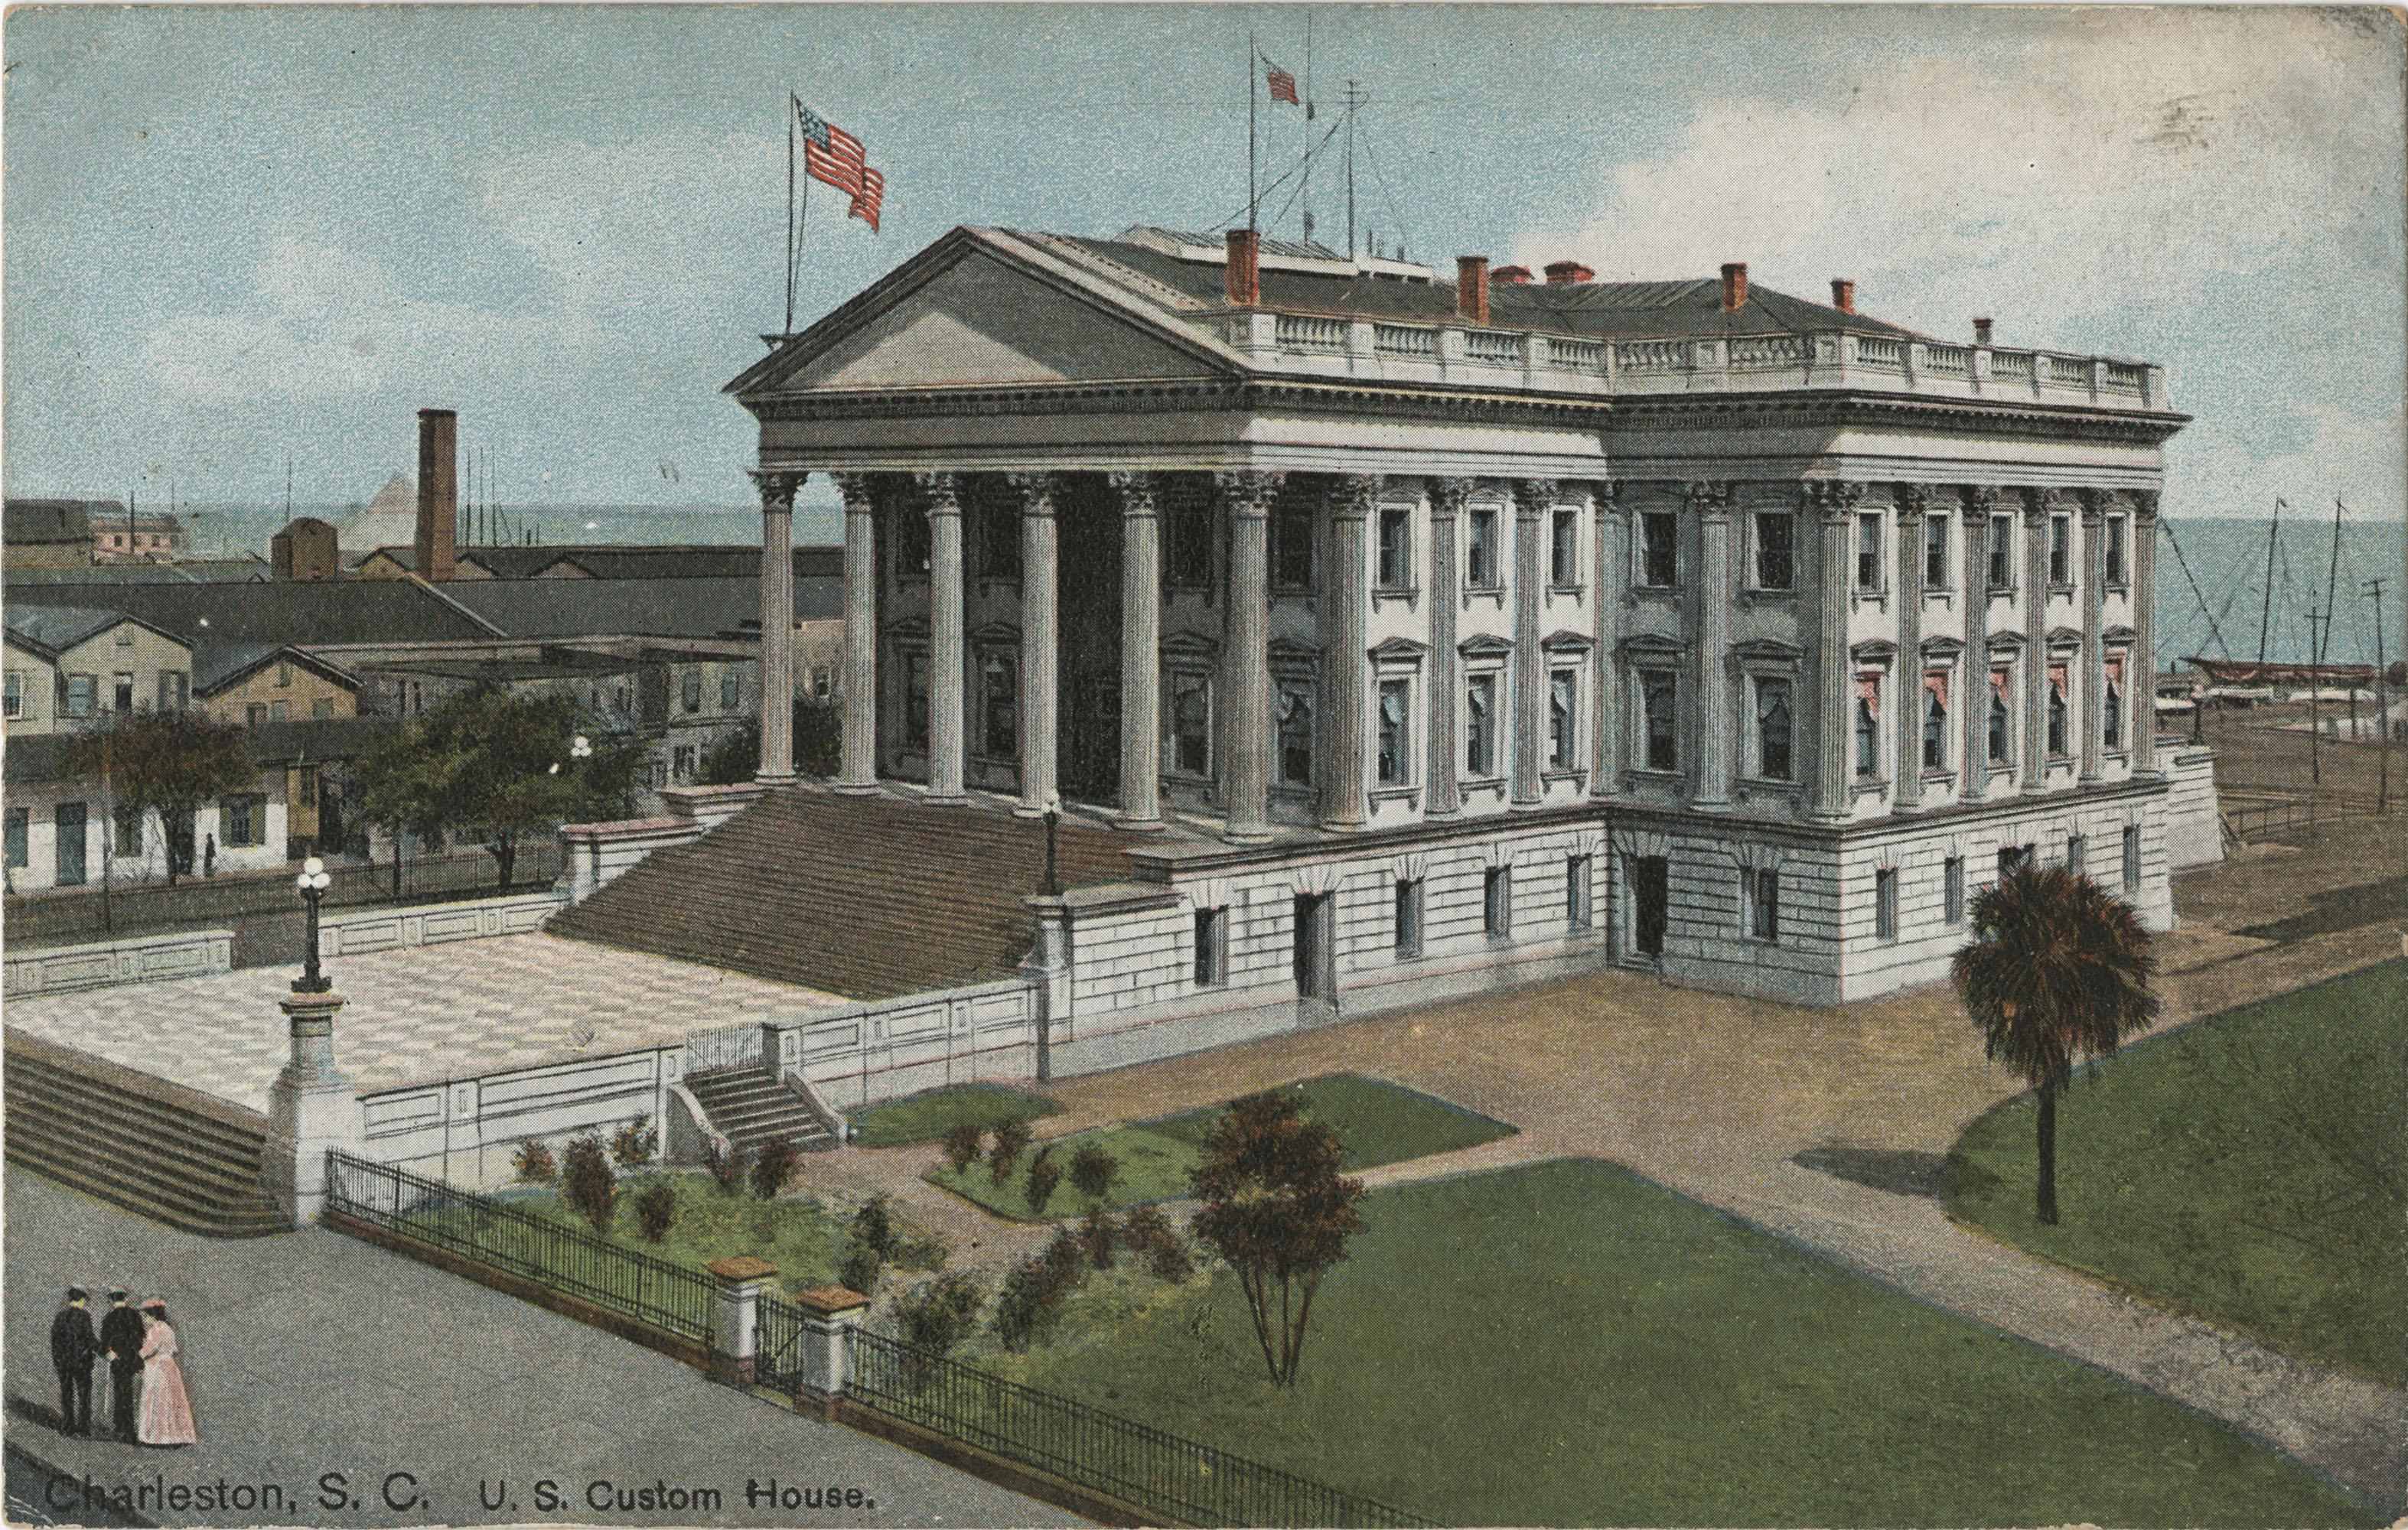 Charleston, S.C. U.S. Custom House